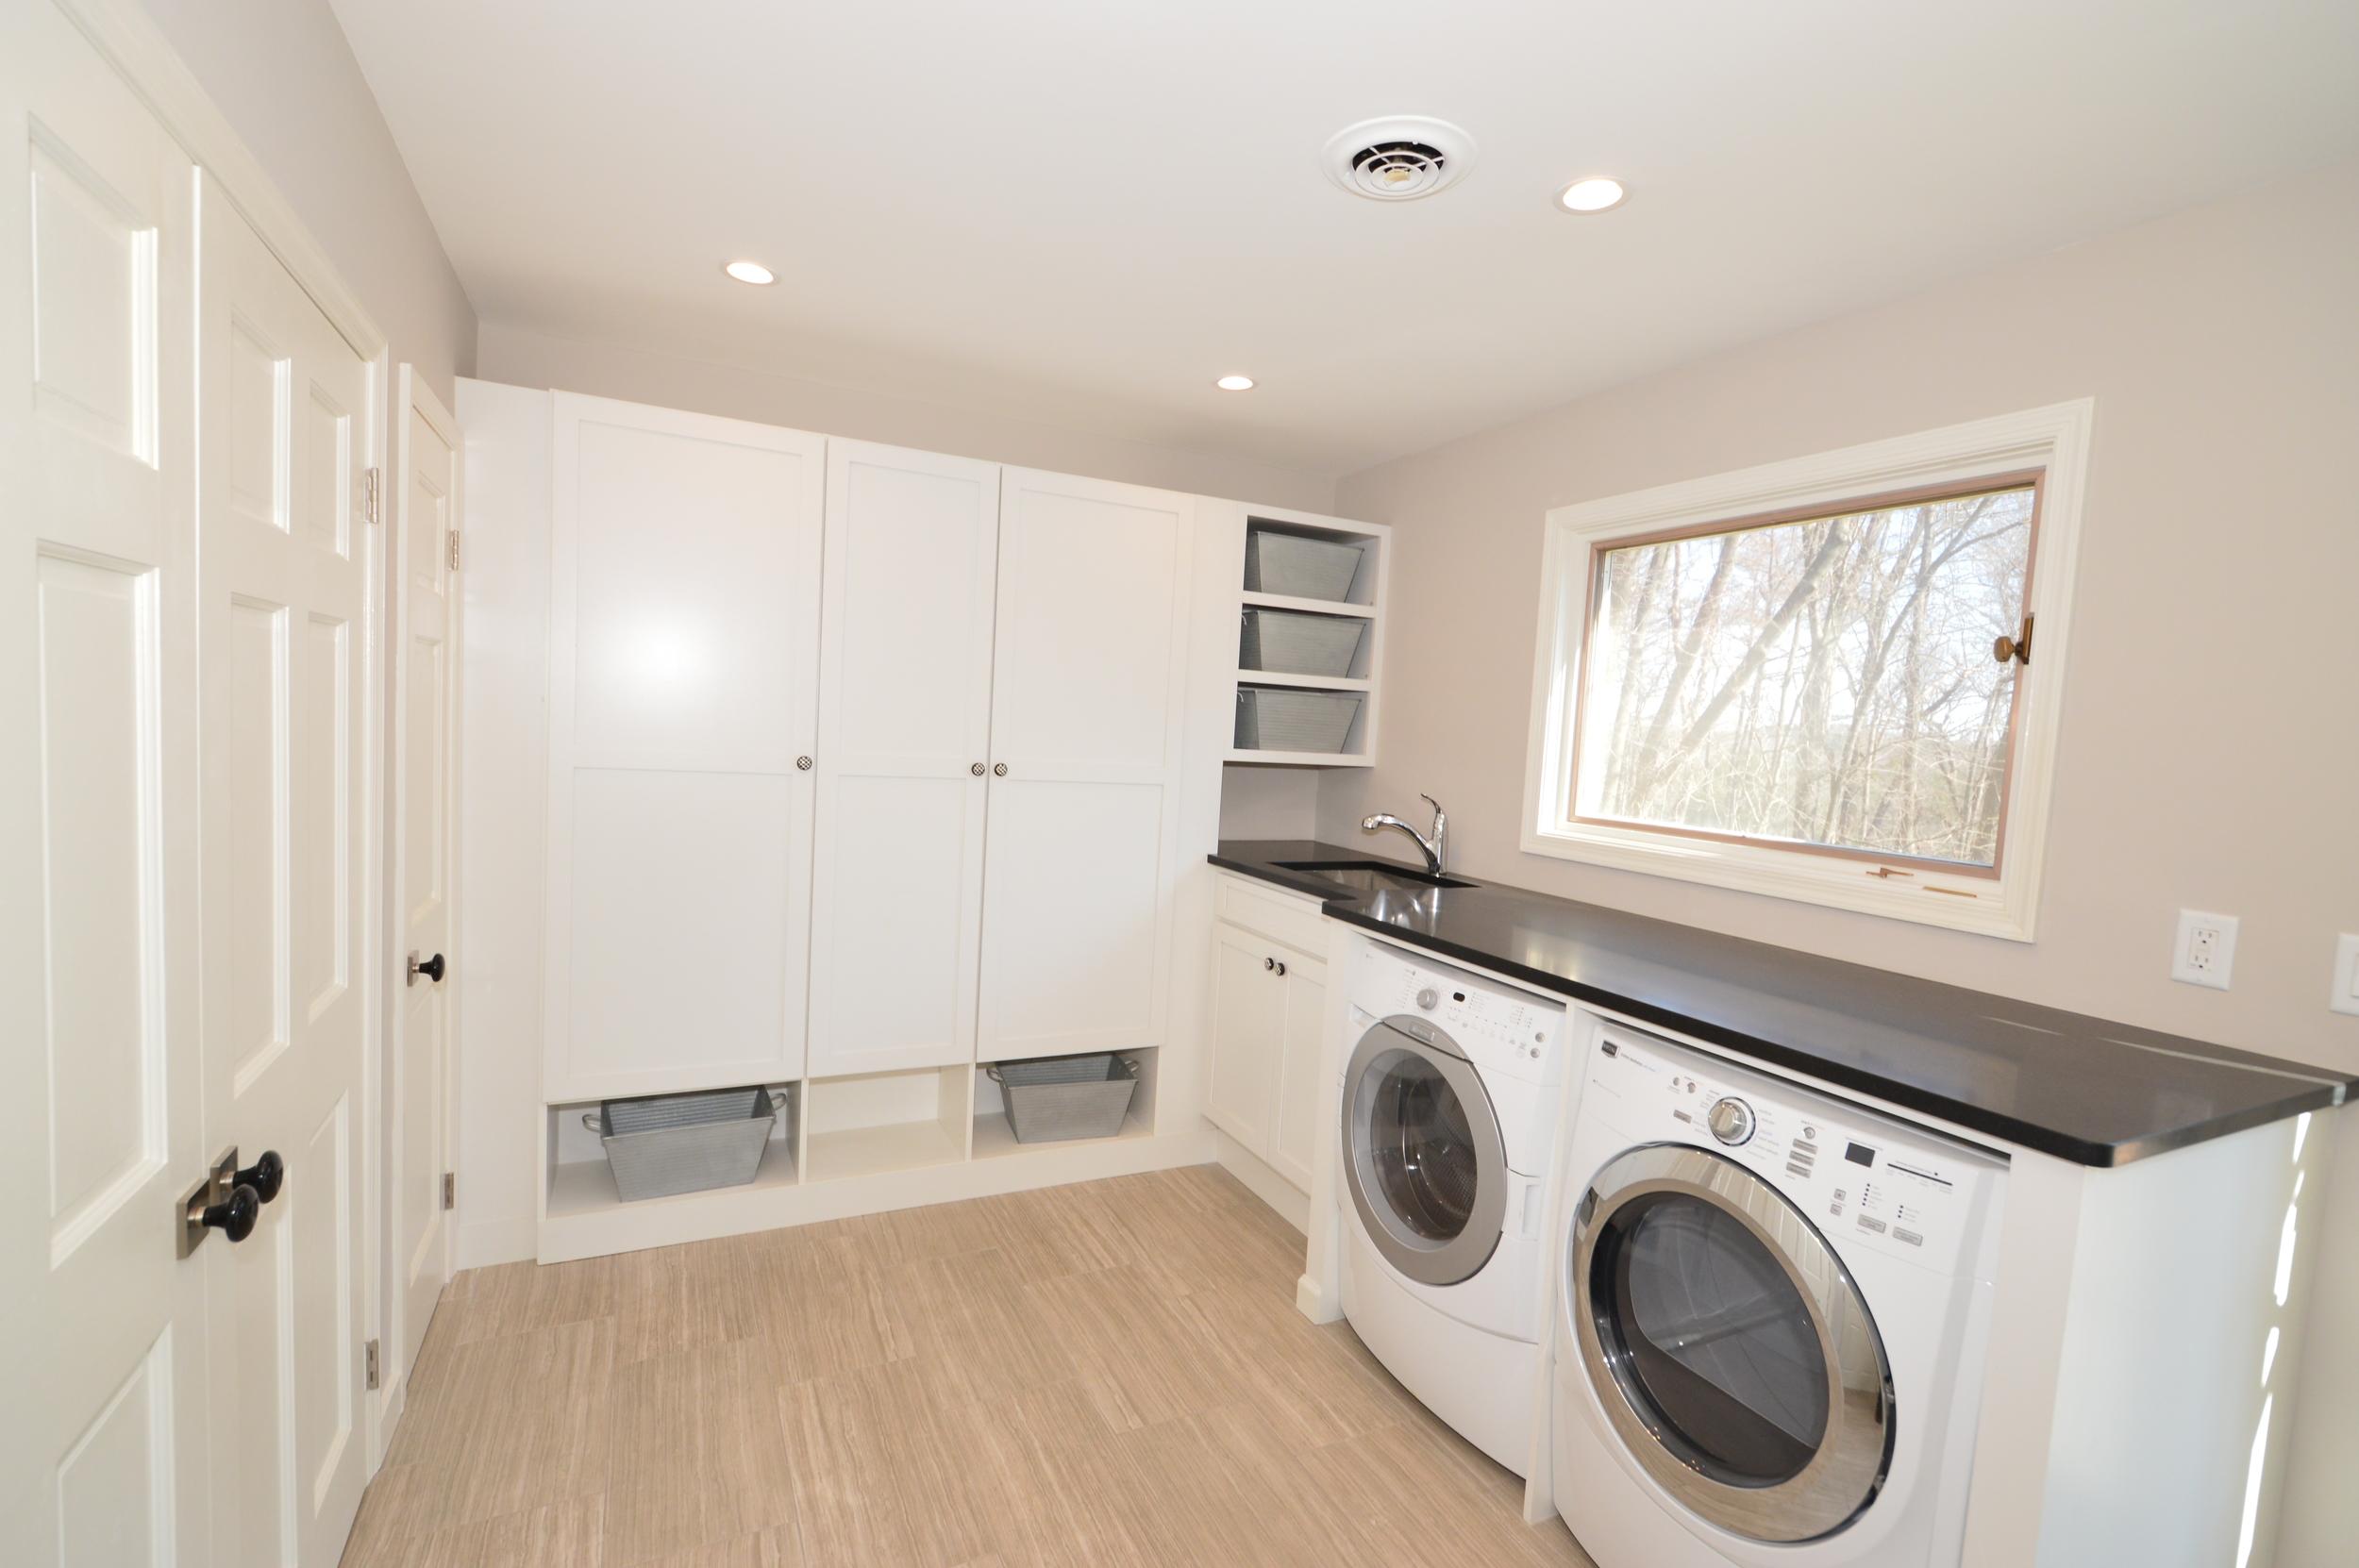 Laundry room renovation in Media, PA